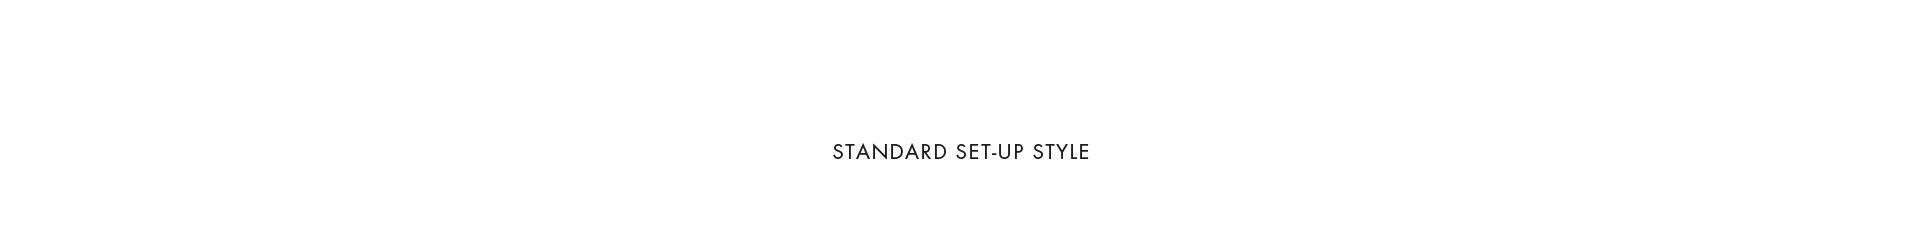 STANDARD SET-UP STYLE